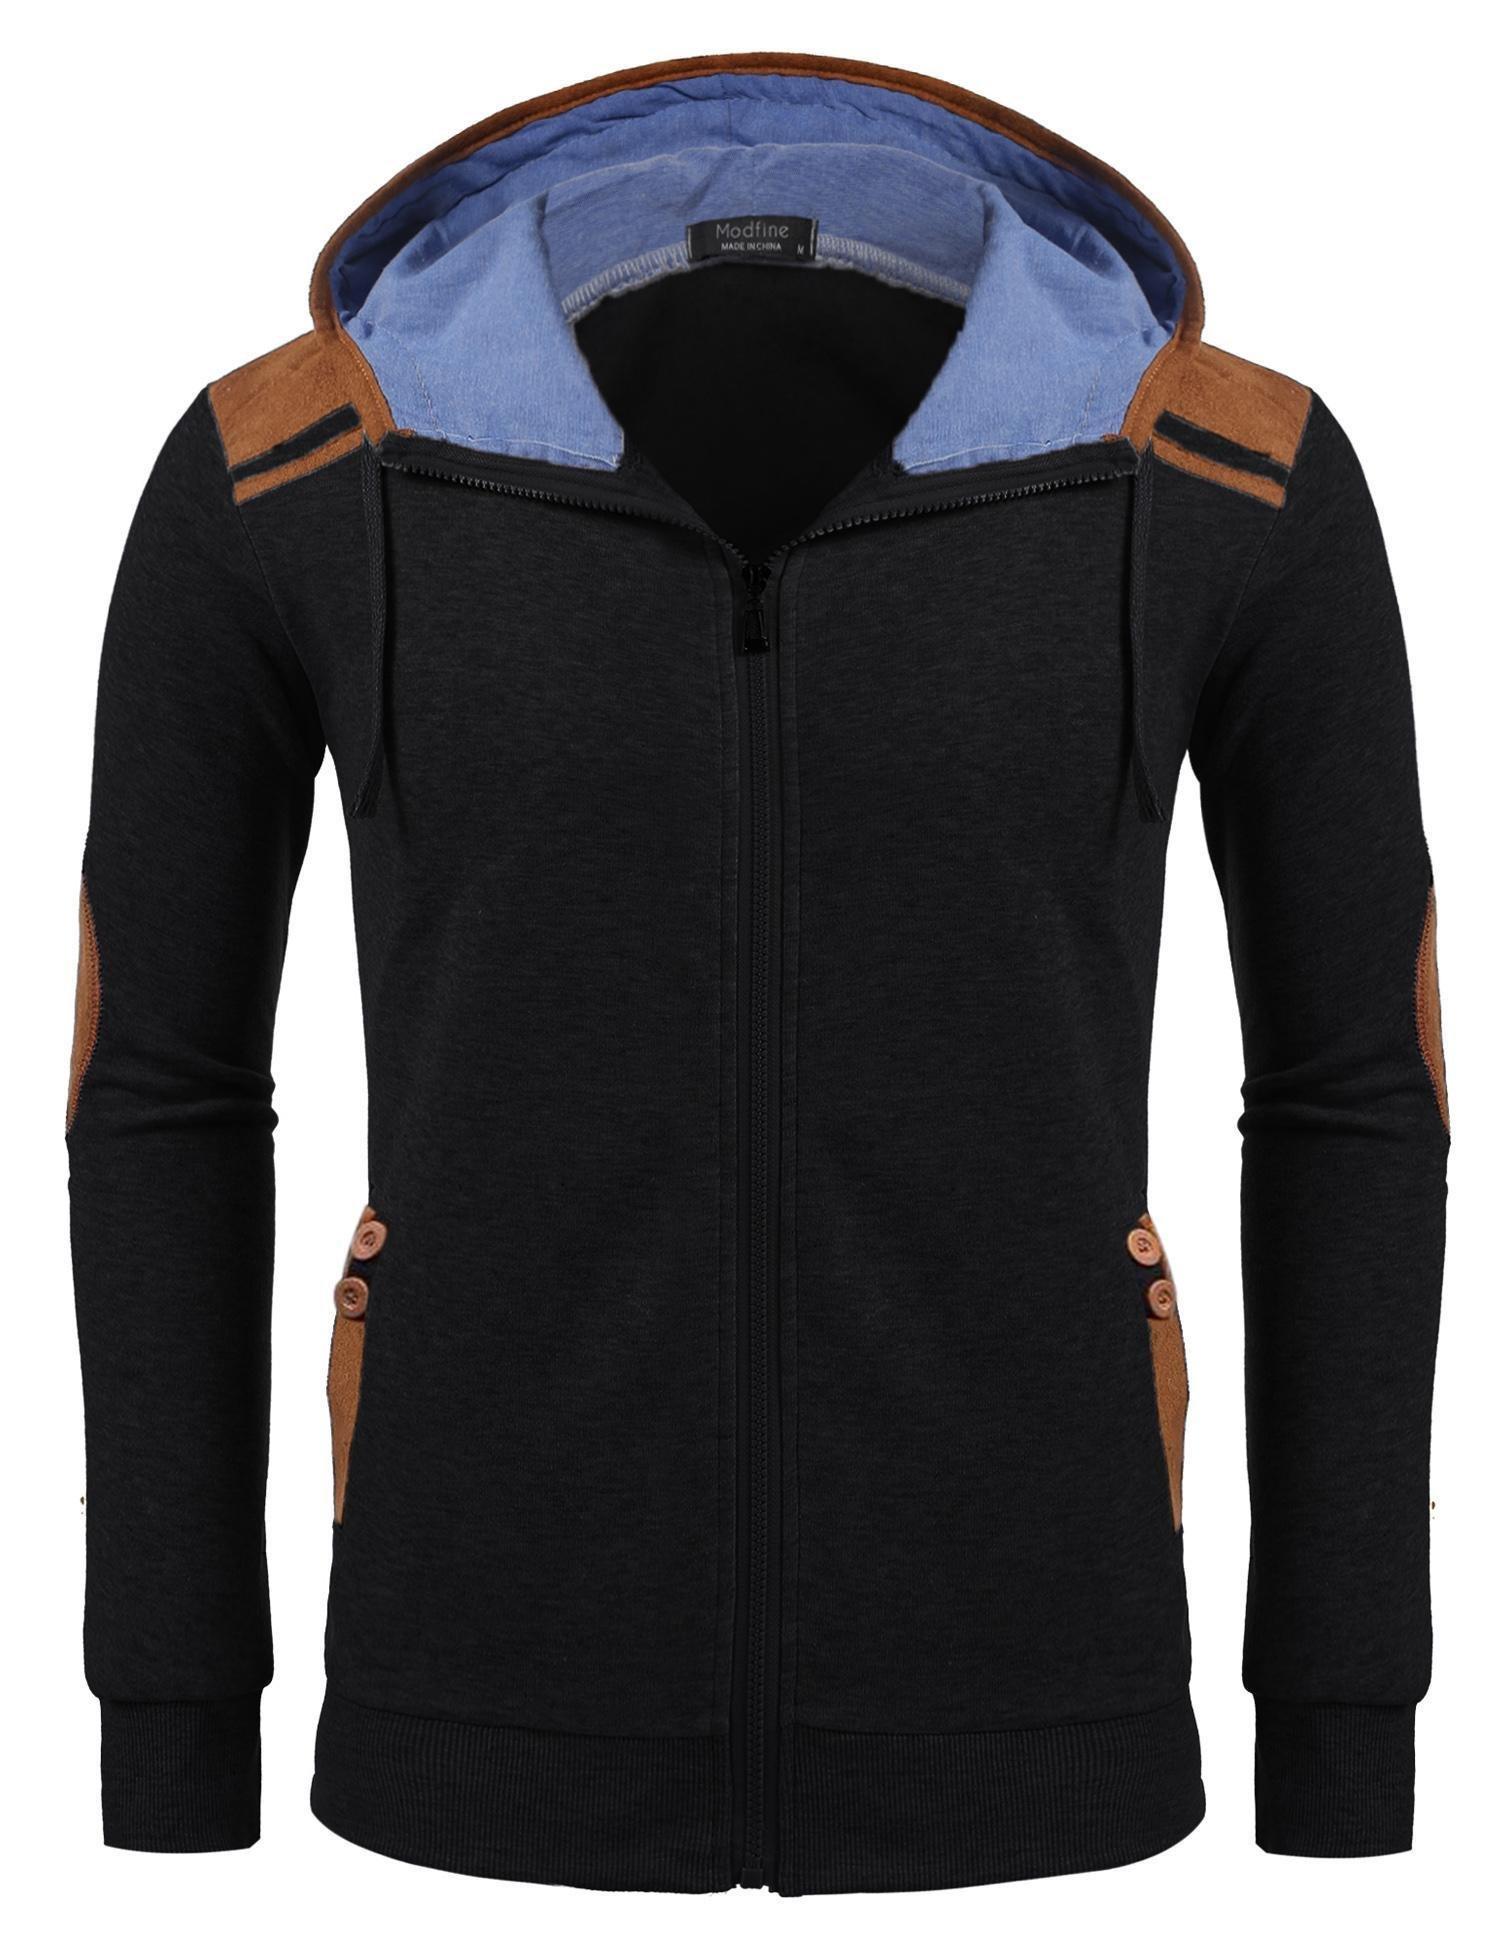 Gotchicon Lightweight Full Zip up Fleece Hoodie Hooded Sweatshirt Jacket for Men(Black,XL) by Gotchicon